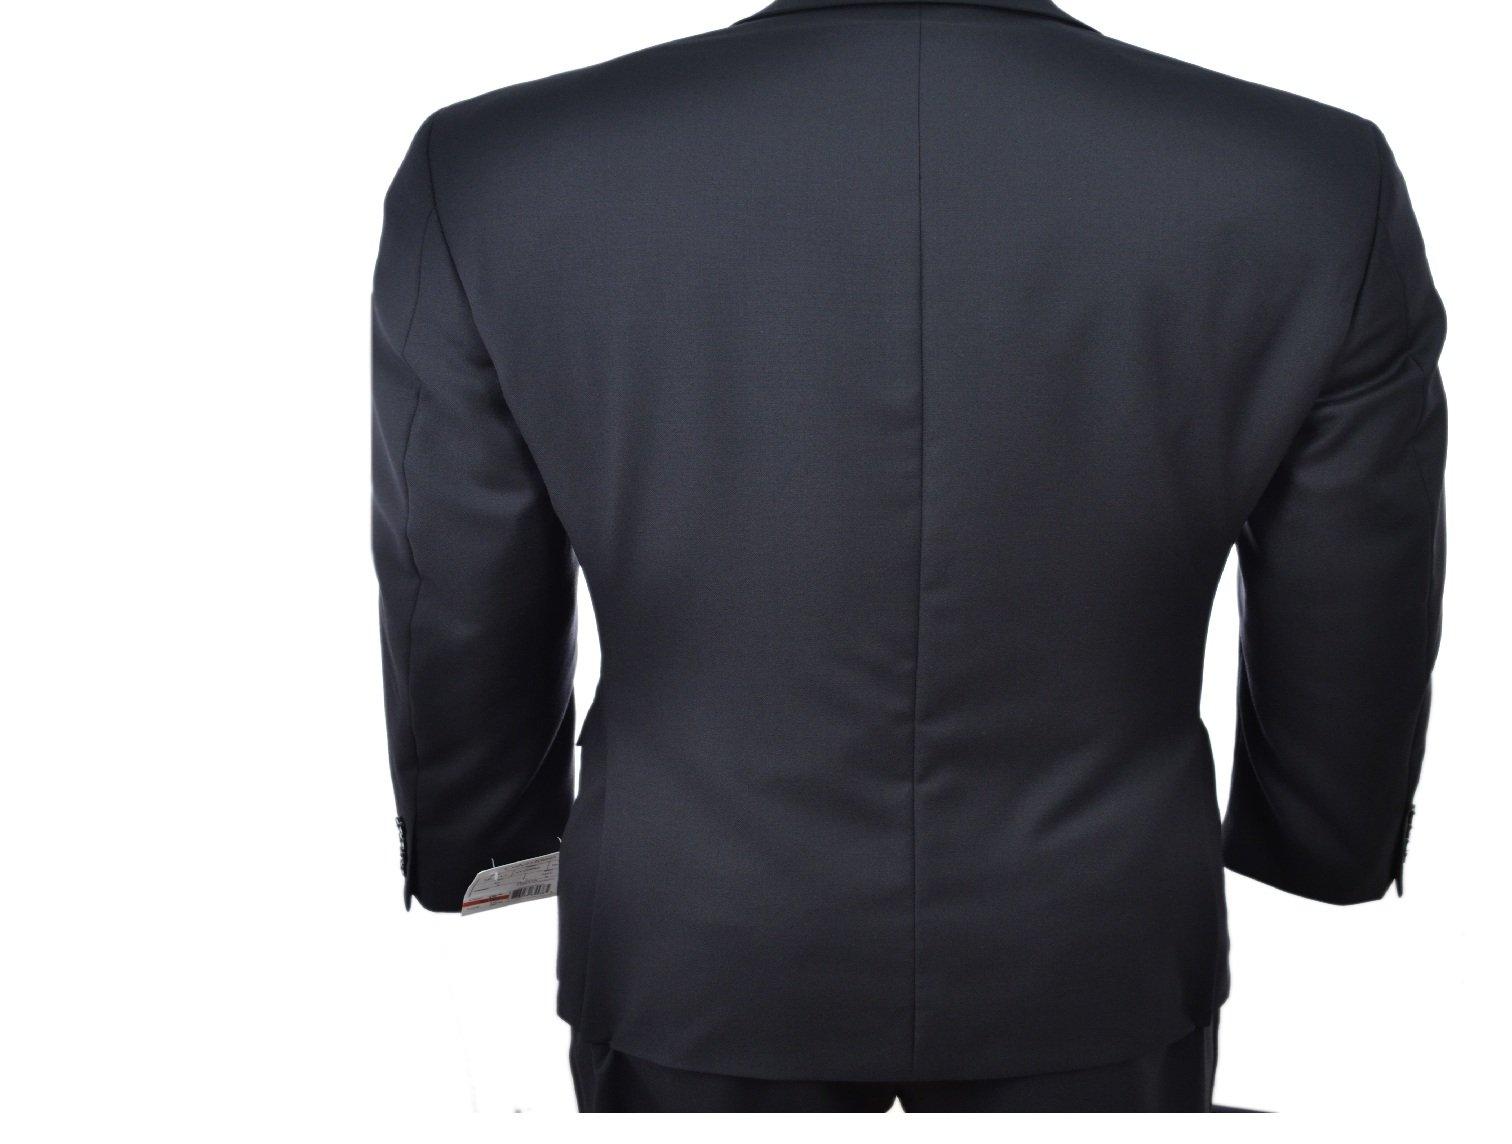 Calvin Klein Slim Fit Black Solid Two Button Wool New Men's Suit Set (44R 40W x 32L) by Calvin ` Klein (Image #3)